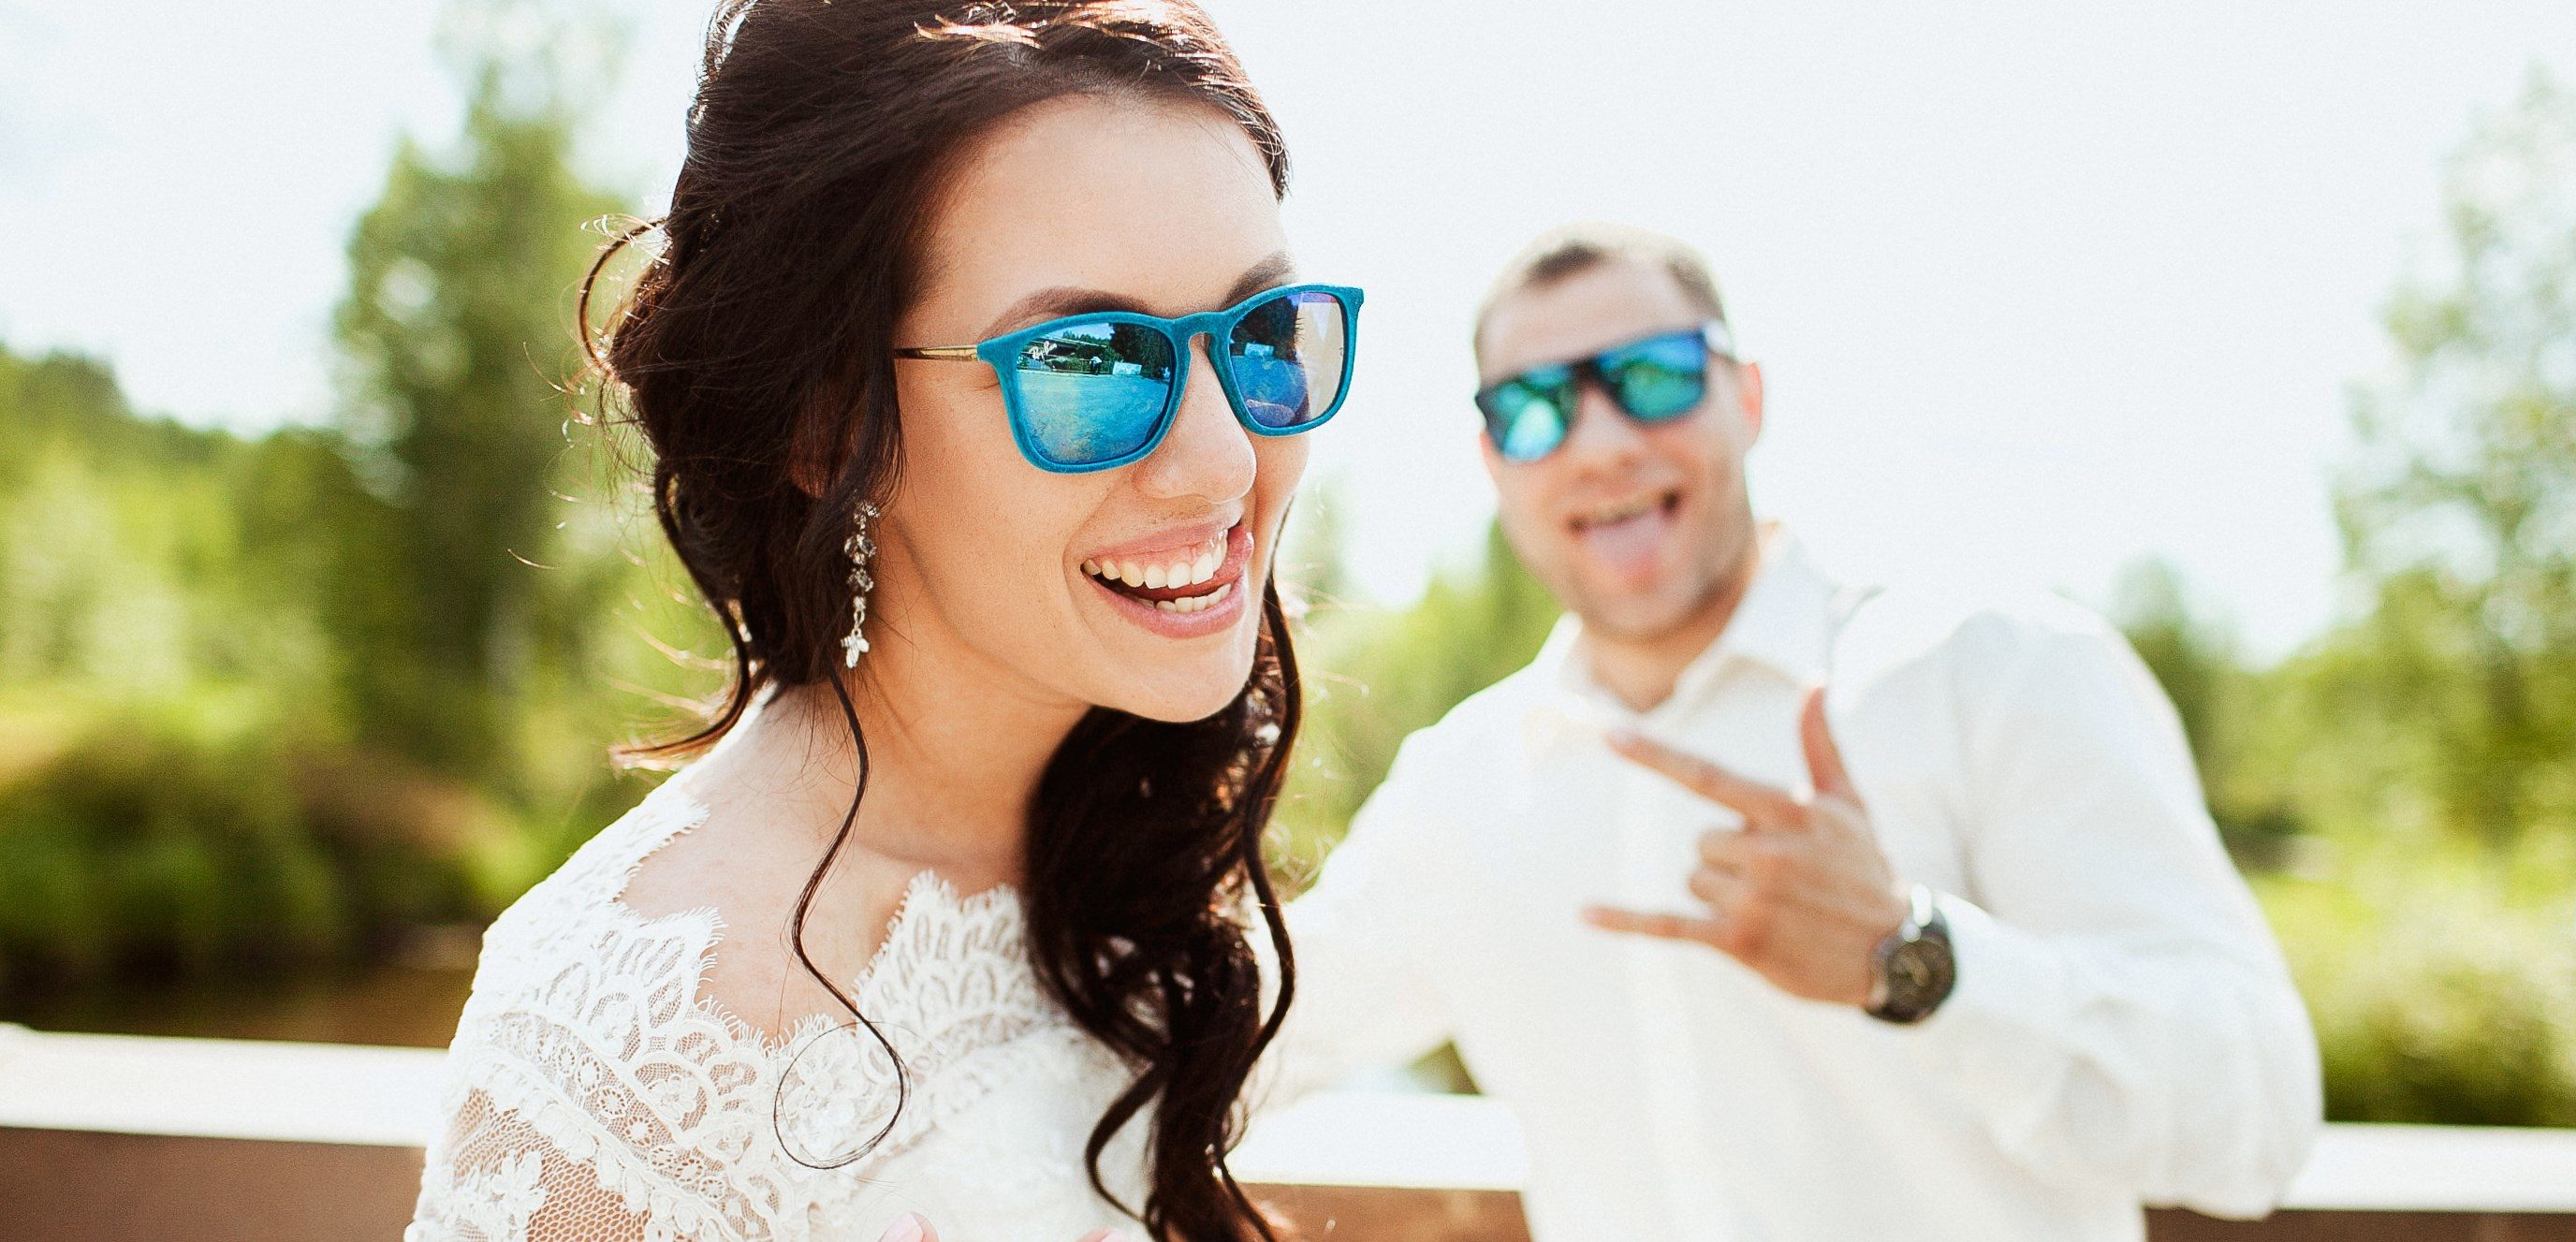 Отпуск на свадьбу по трудовому кодексу